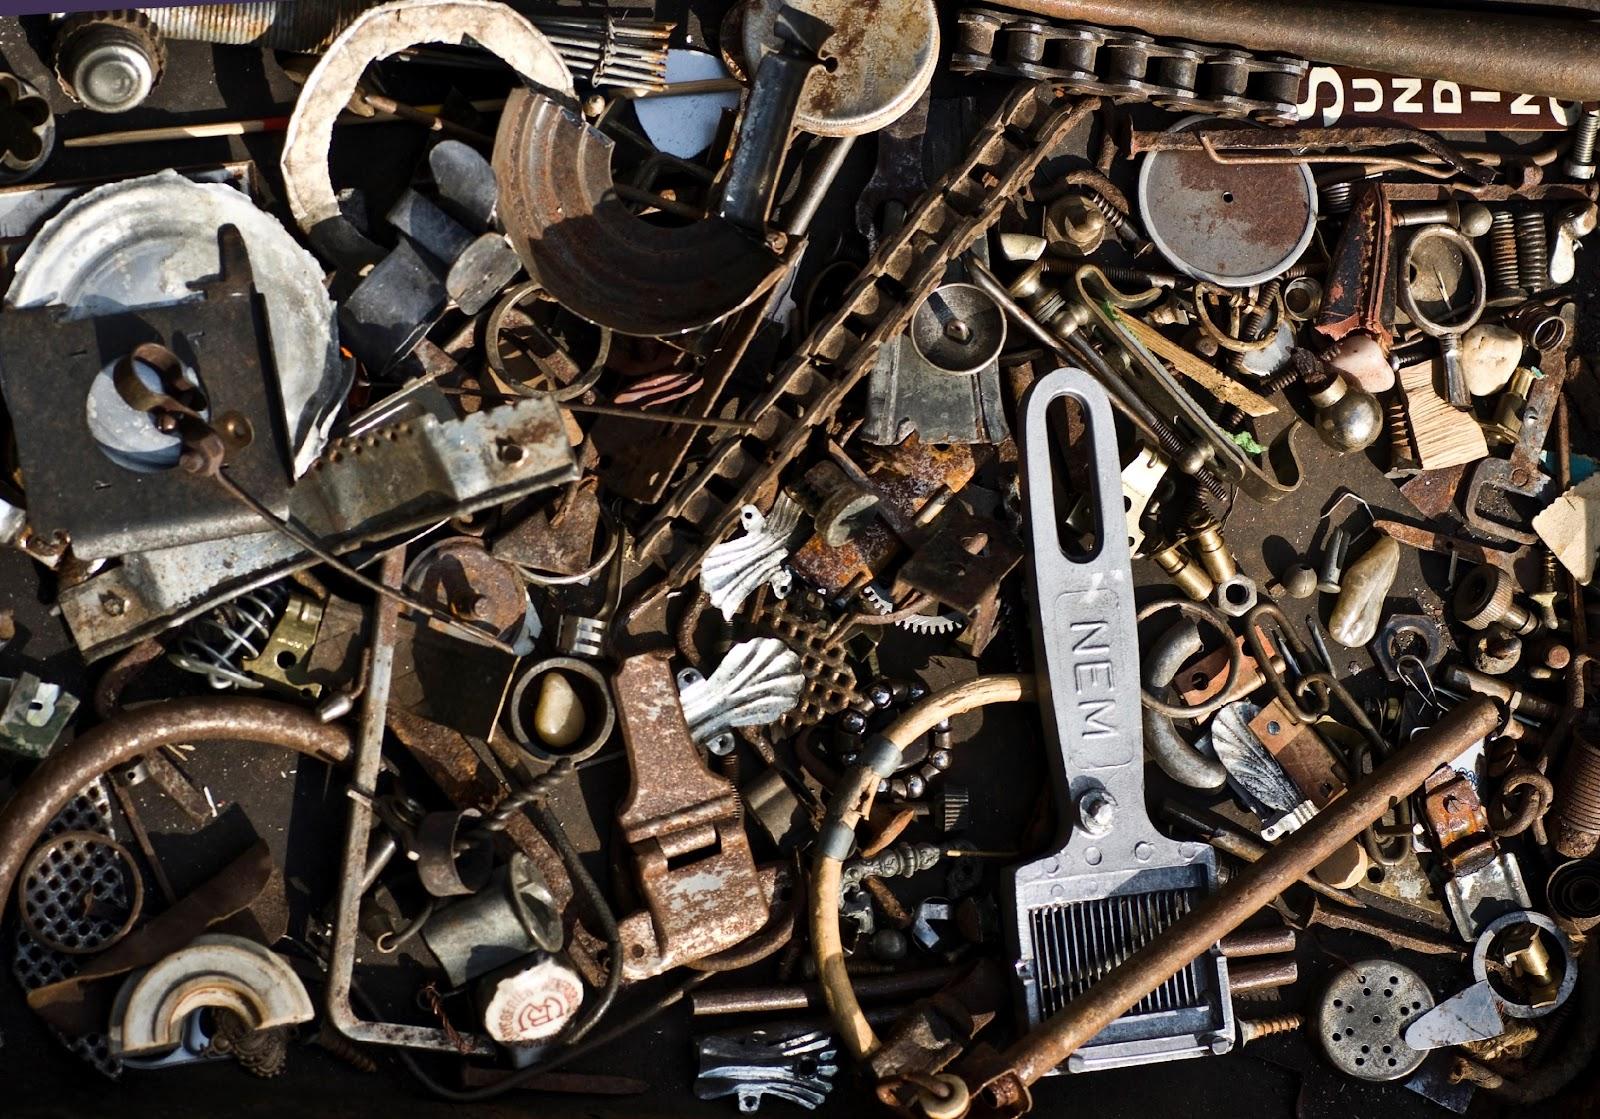 C:\Users\Admin\Desktop\Project PBN\Thu mua Phế Liệu\images\Collection_of_leftover_scrap_metal_items.jpg